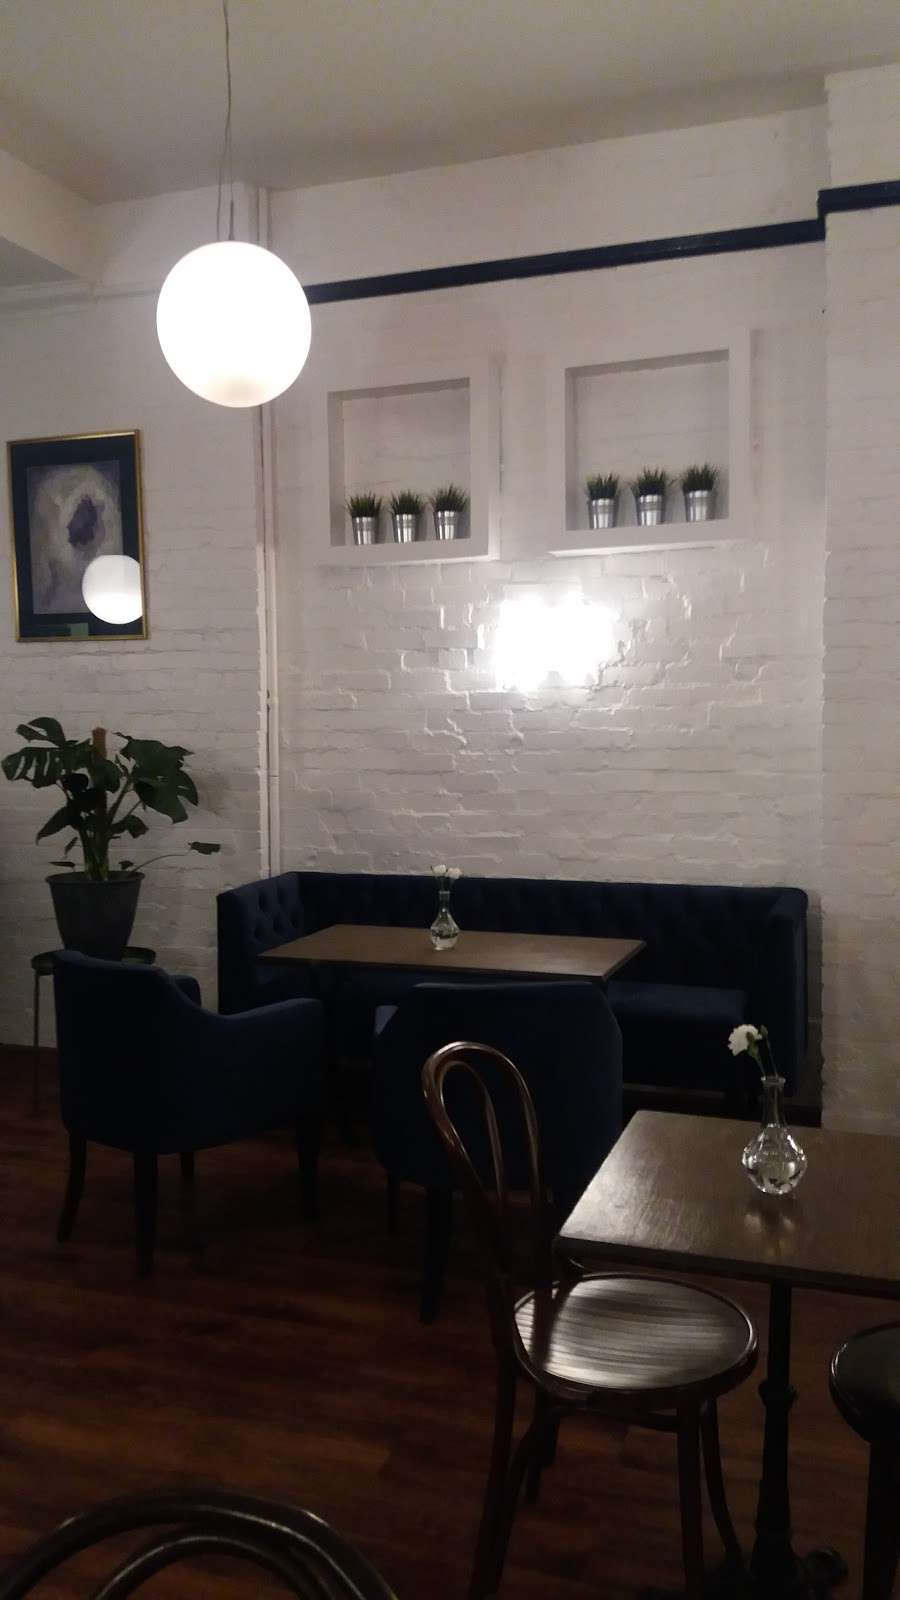 STELLAS ROOM - cafe  | Photo 4 of 10 | Address: 46 Fortis Green Rd, London N10 3HN, UK | Phone: 07789 250612